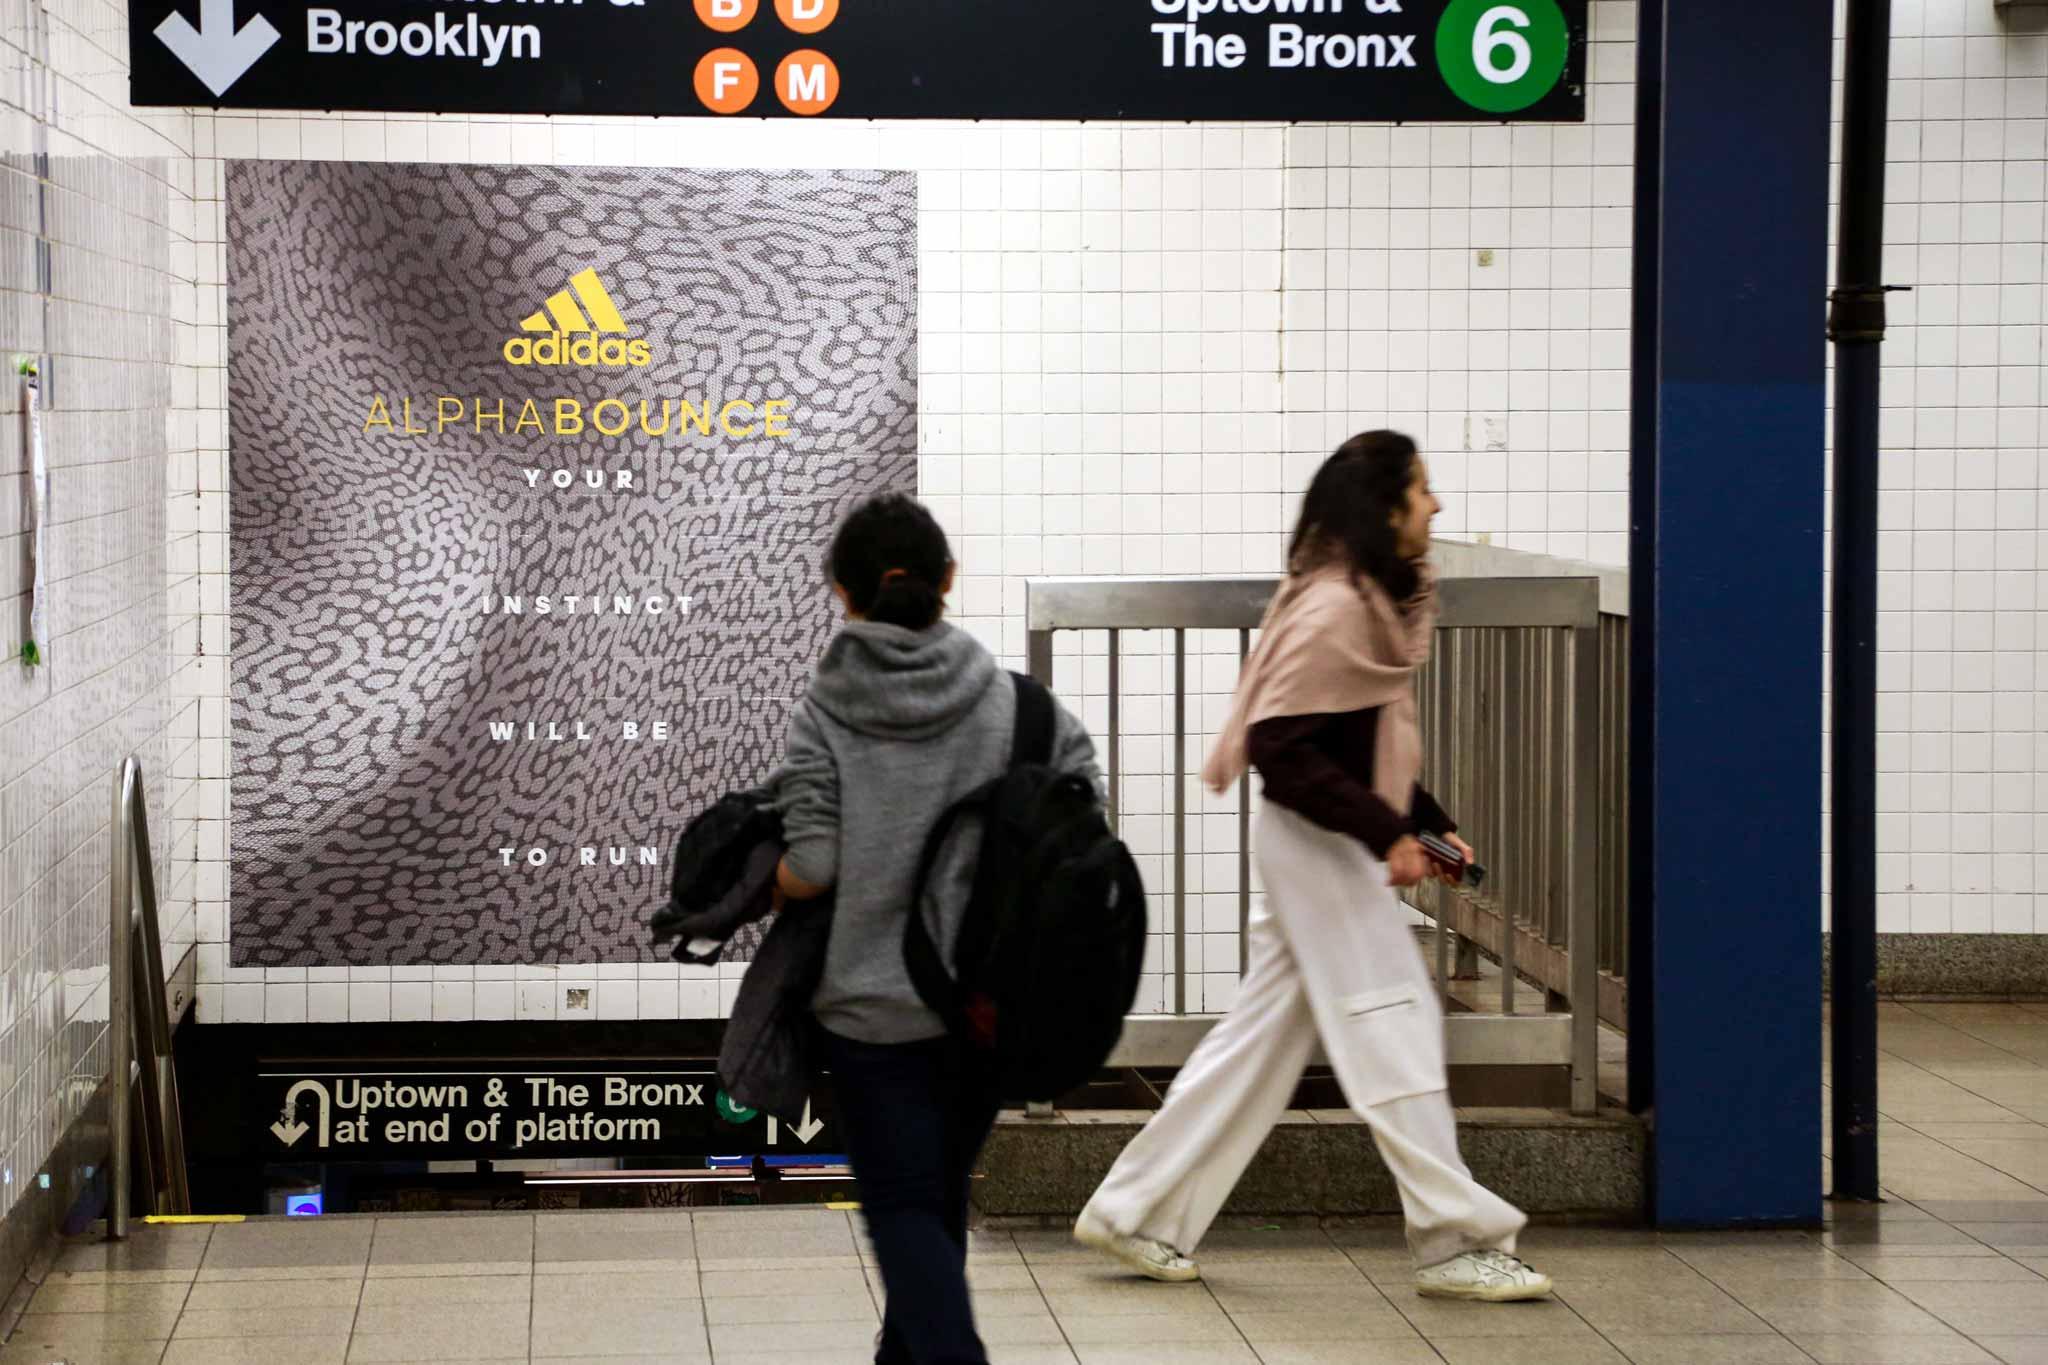 Adidas-Broadway&Laffyette-2.jpg